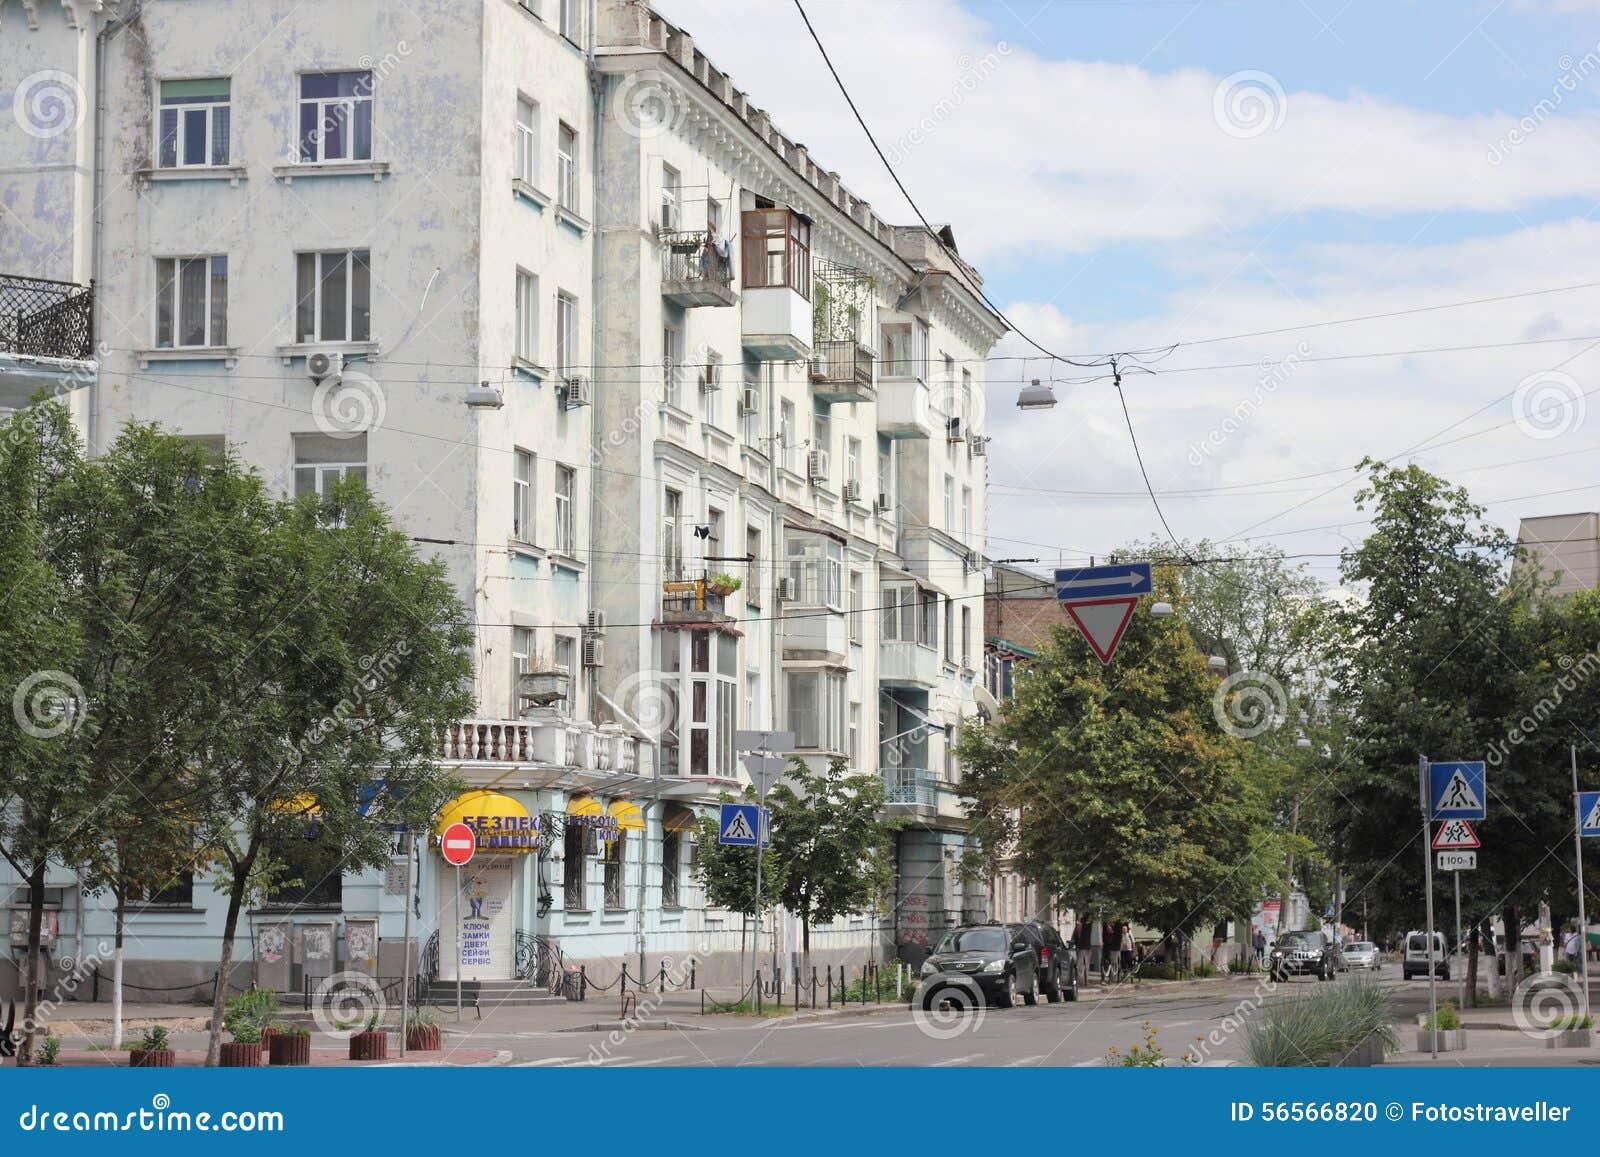 Download Σταυροδρόμια των αρχαίων οδών της πόλης Εκδοτική εικόνα - εικόνα από στόκος, αρχιτεκτονικής: 56566820